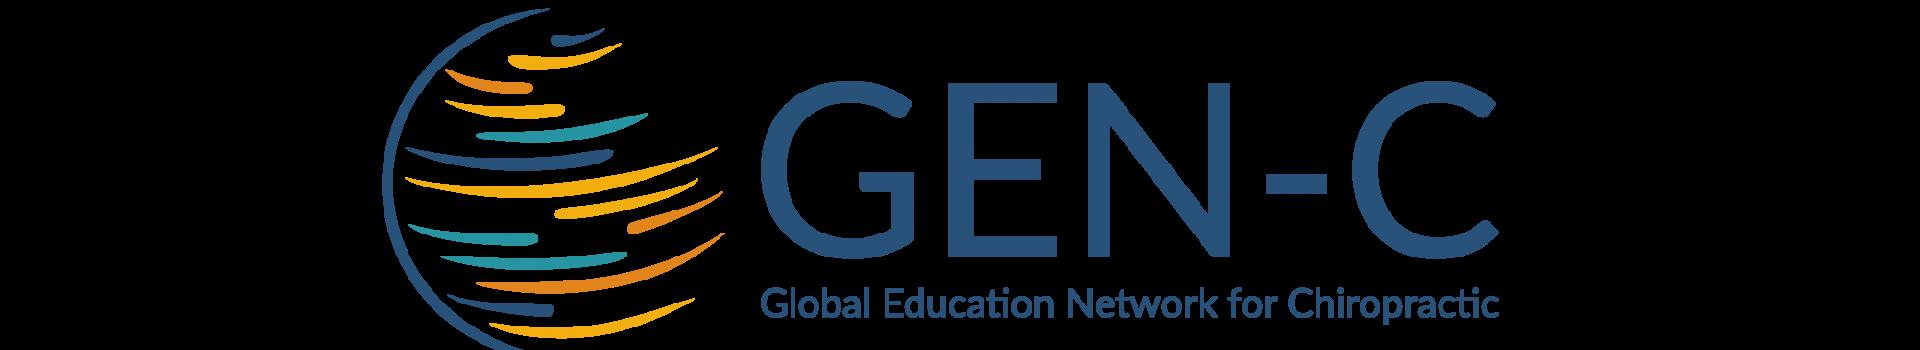 gen-c-logo